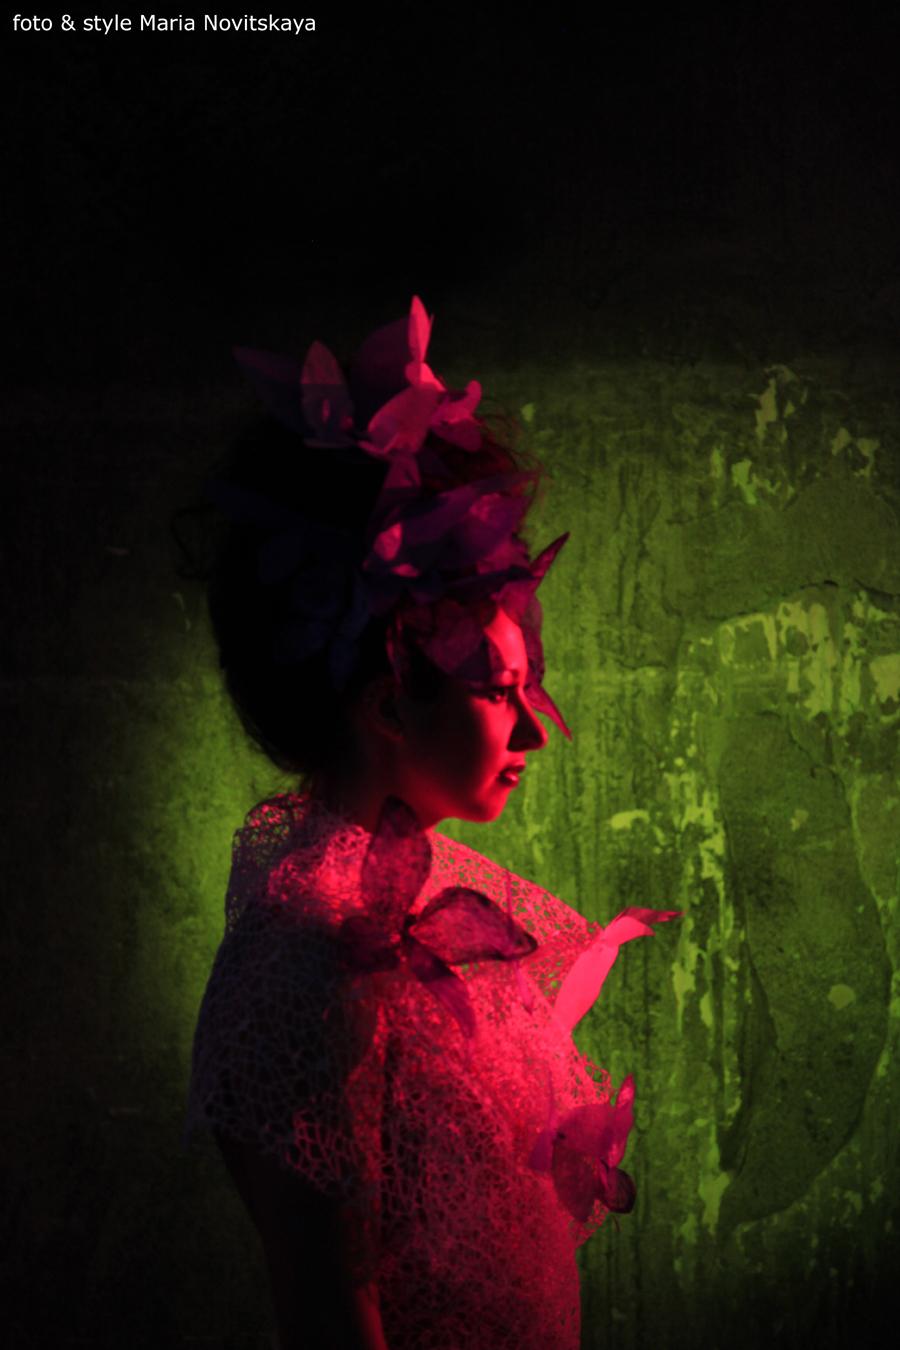 Певица Атмосфера - Ольга Бутусова: Съёмки видеоклипа